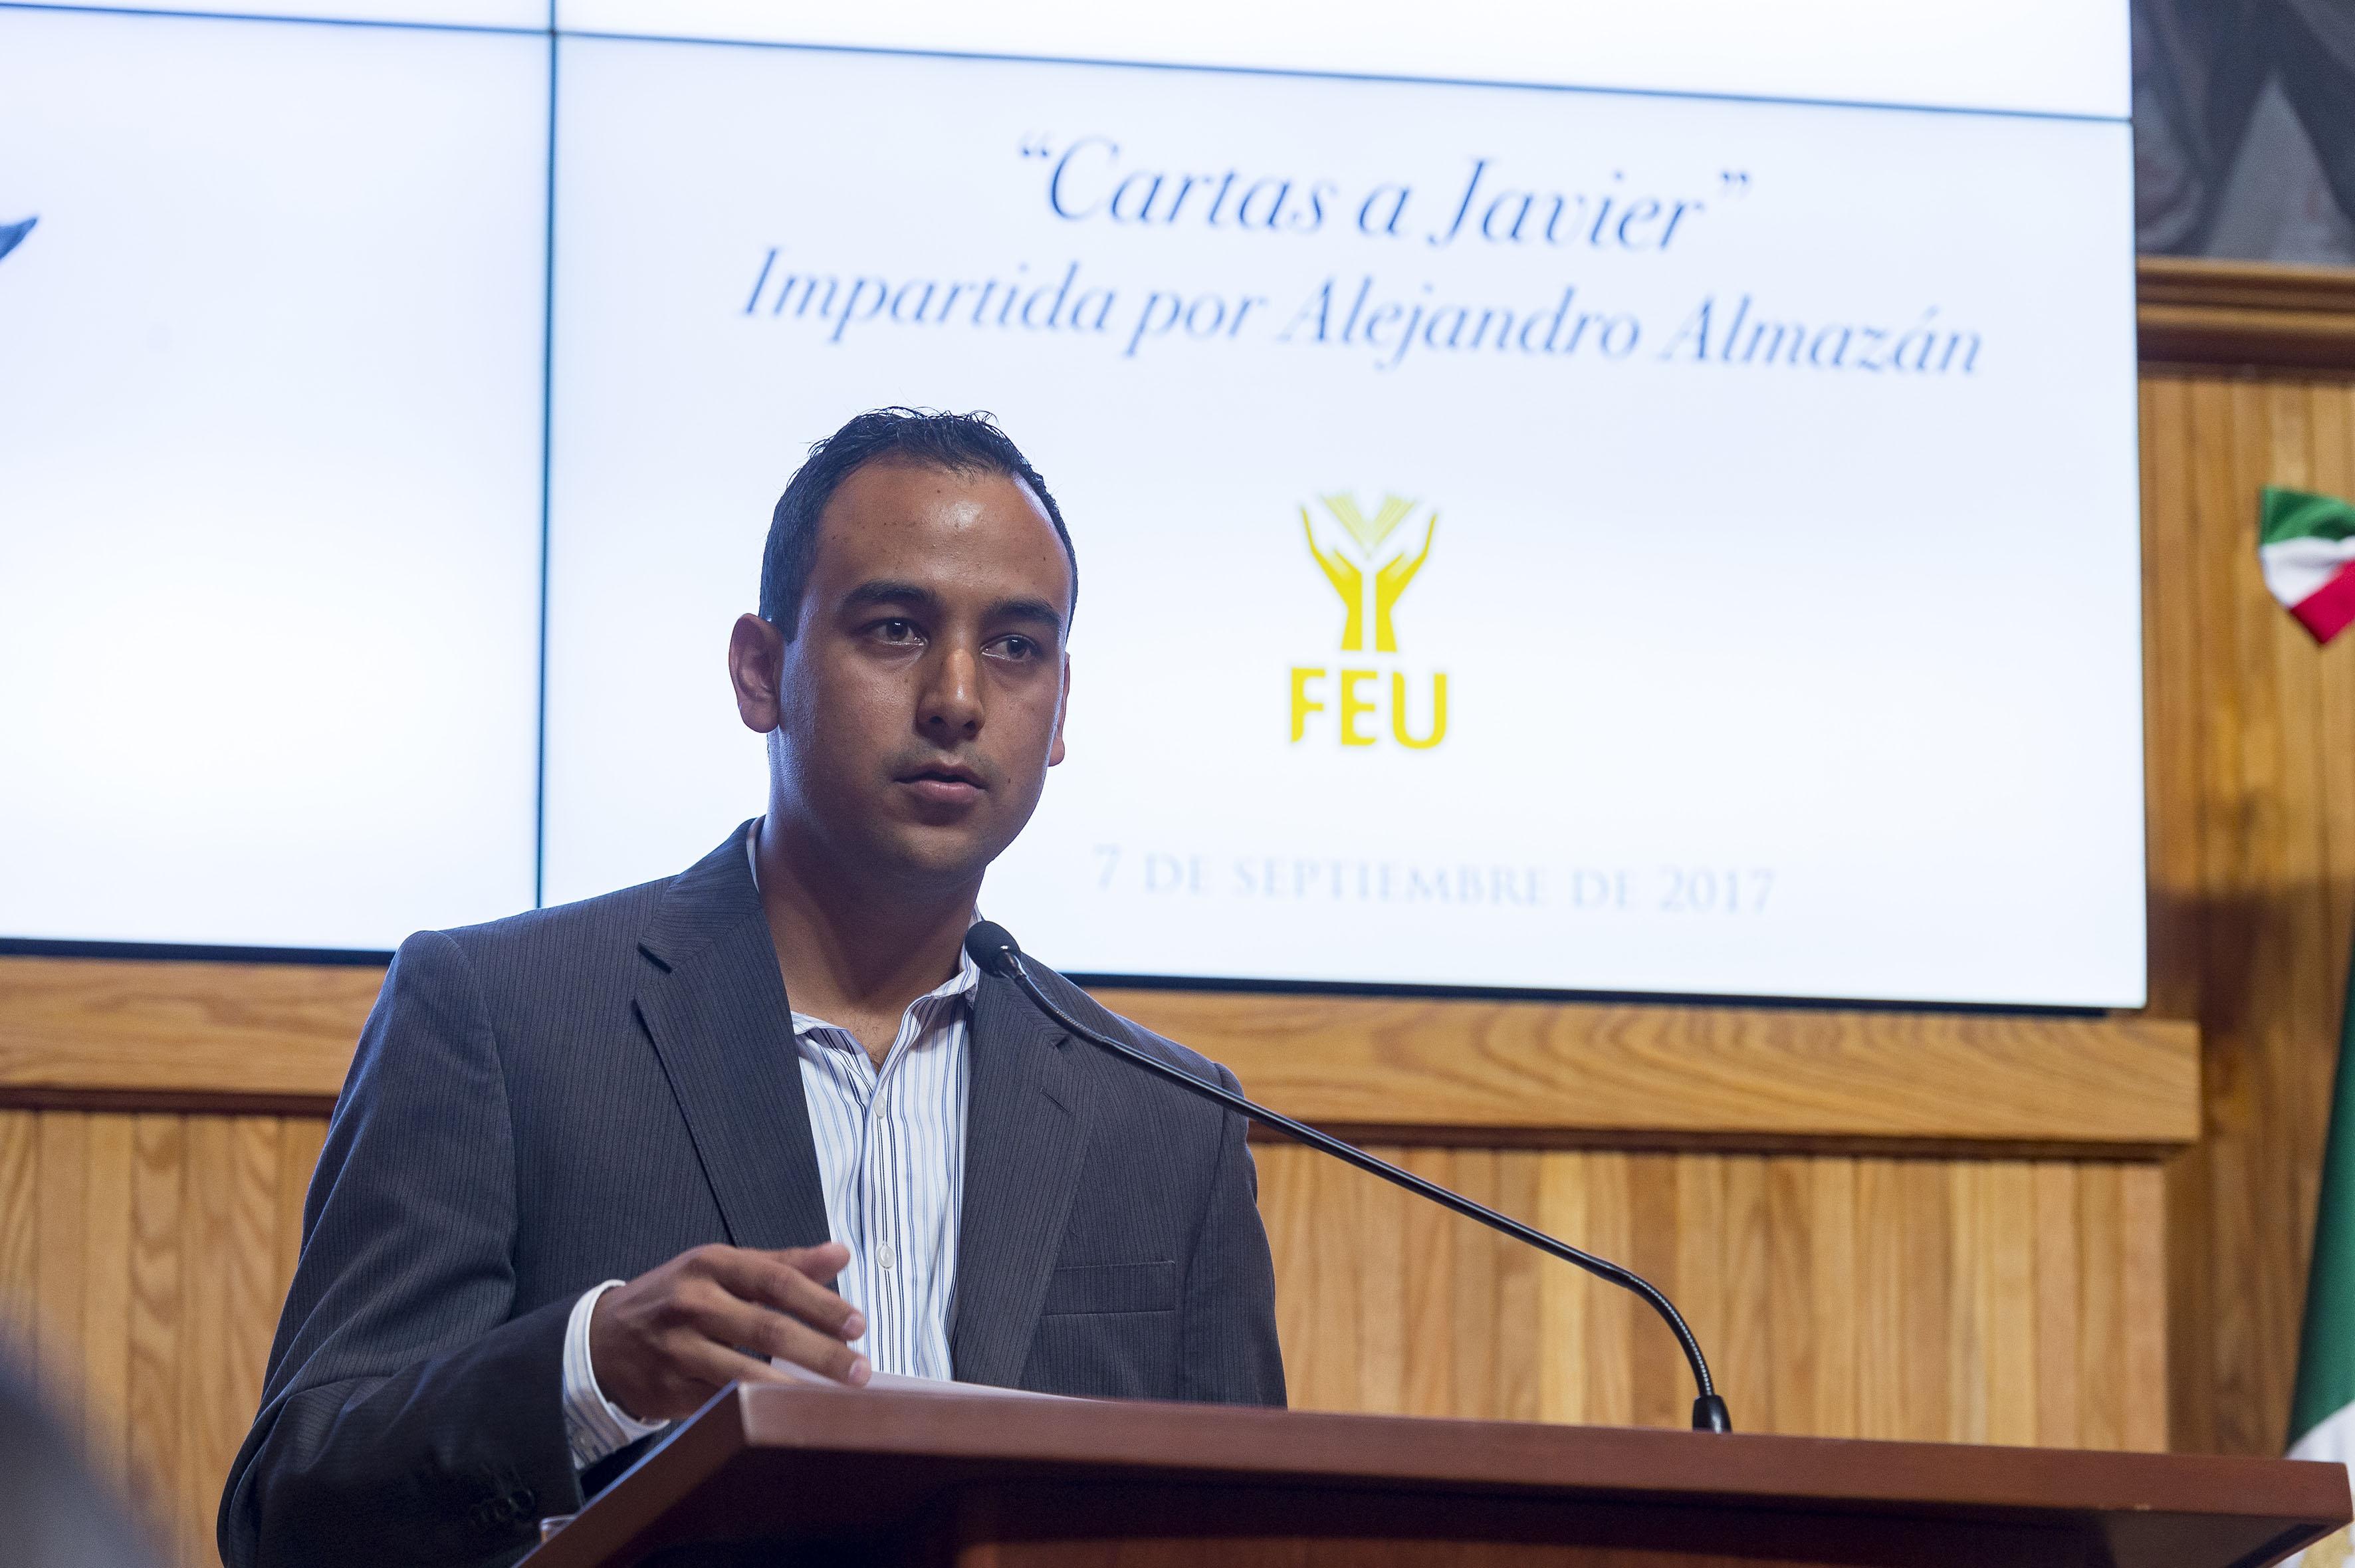 Presidente de la FEU Jesús Medina Varela, haciendo uso de la palabra